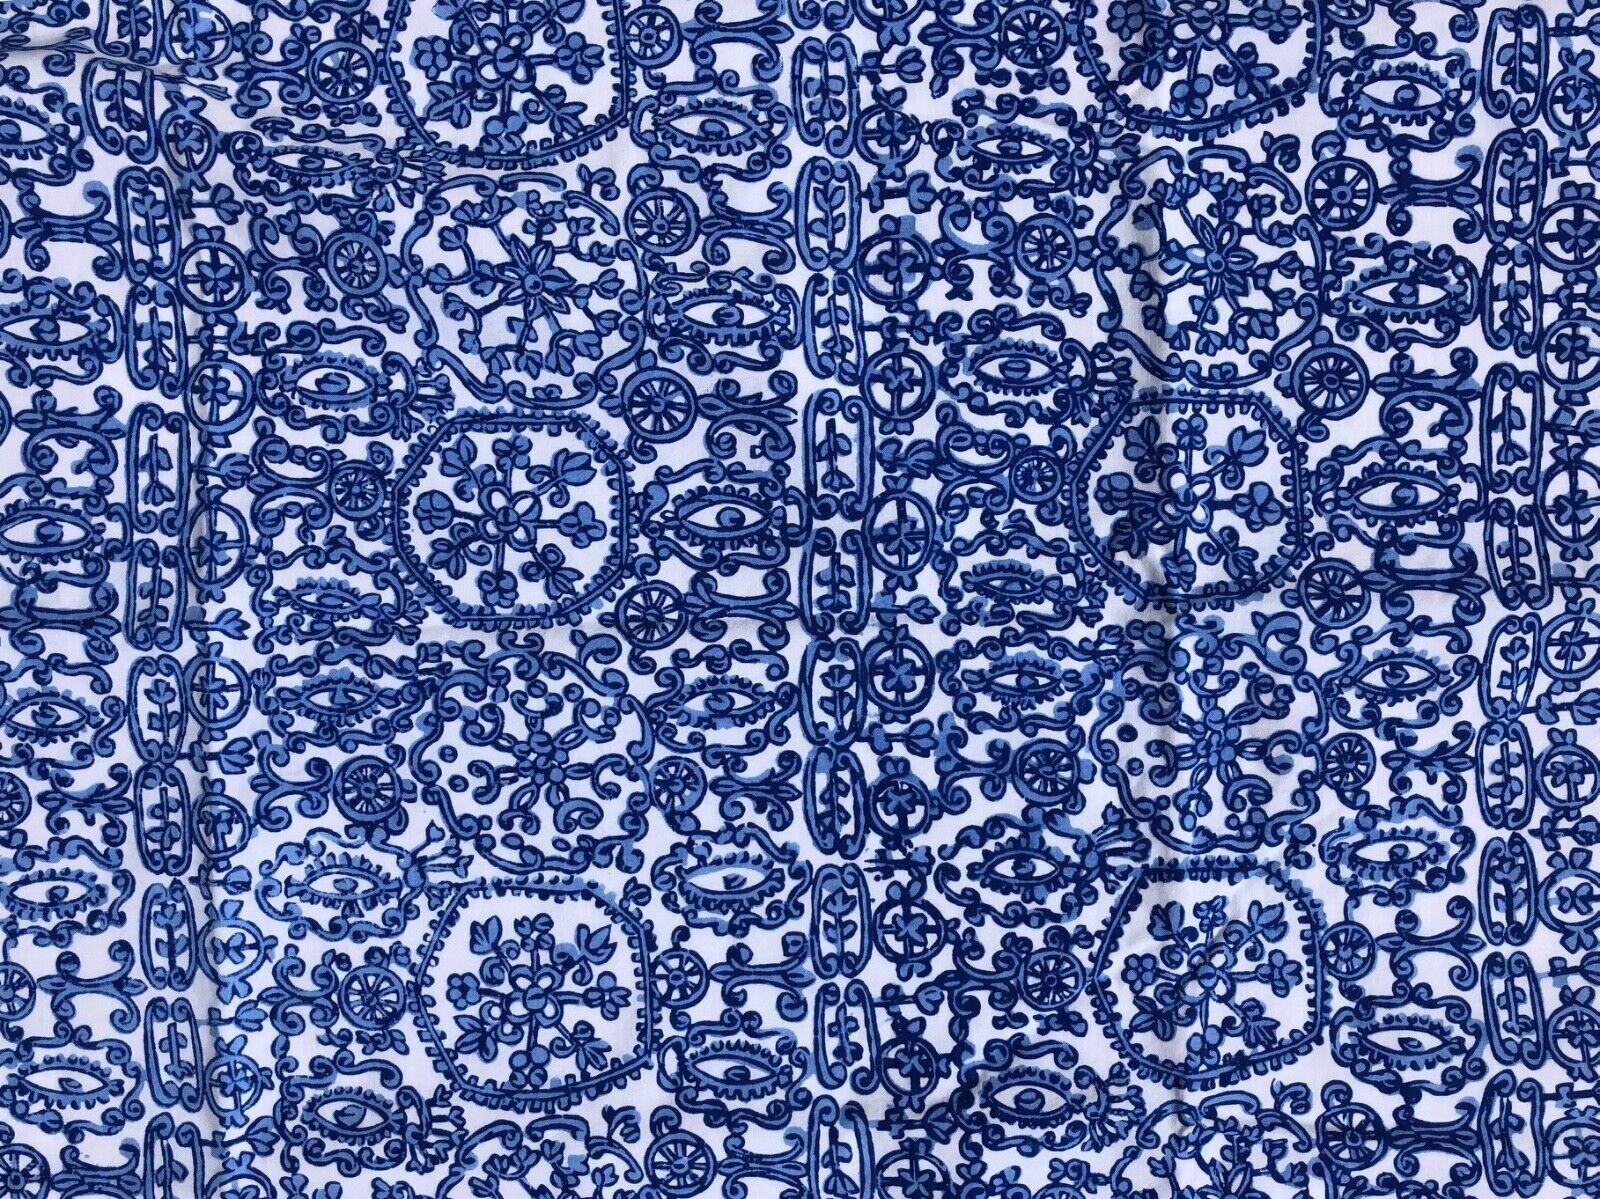 D. PORTHAULT King Pillow Cases Blue White 100% Cotton Scallo